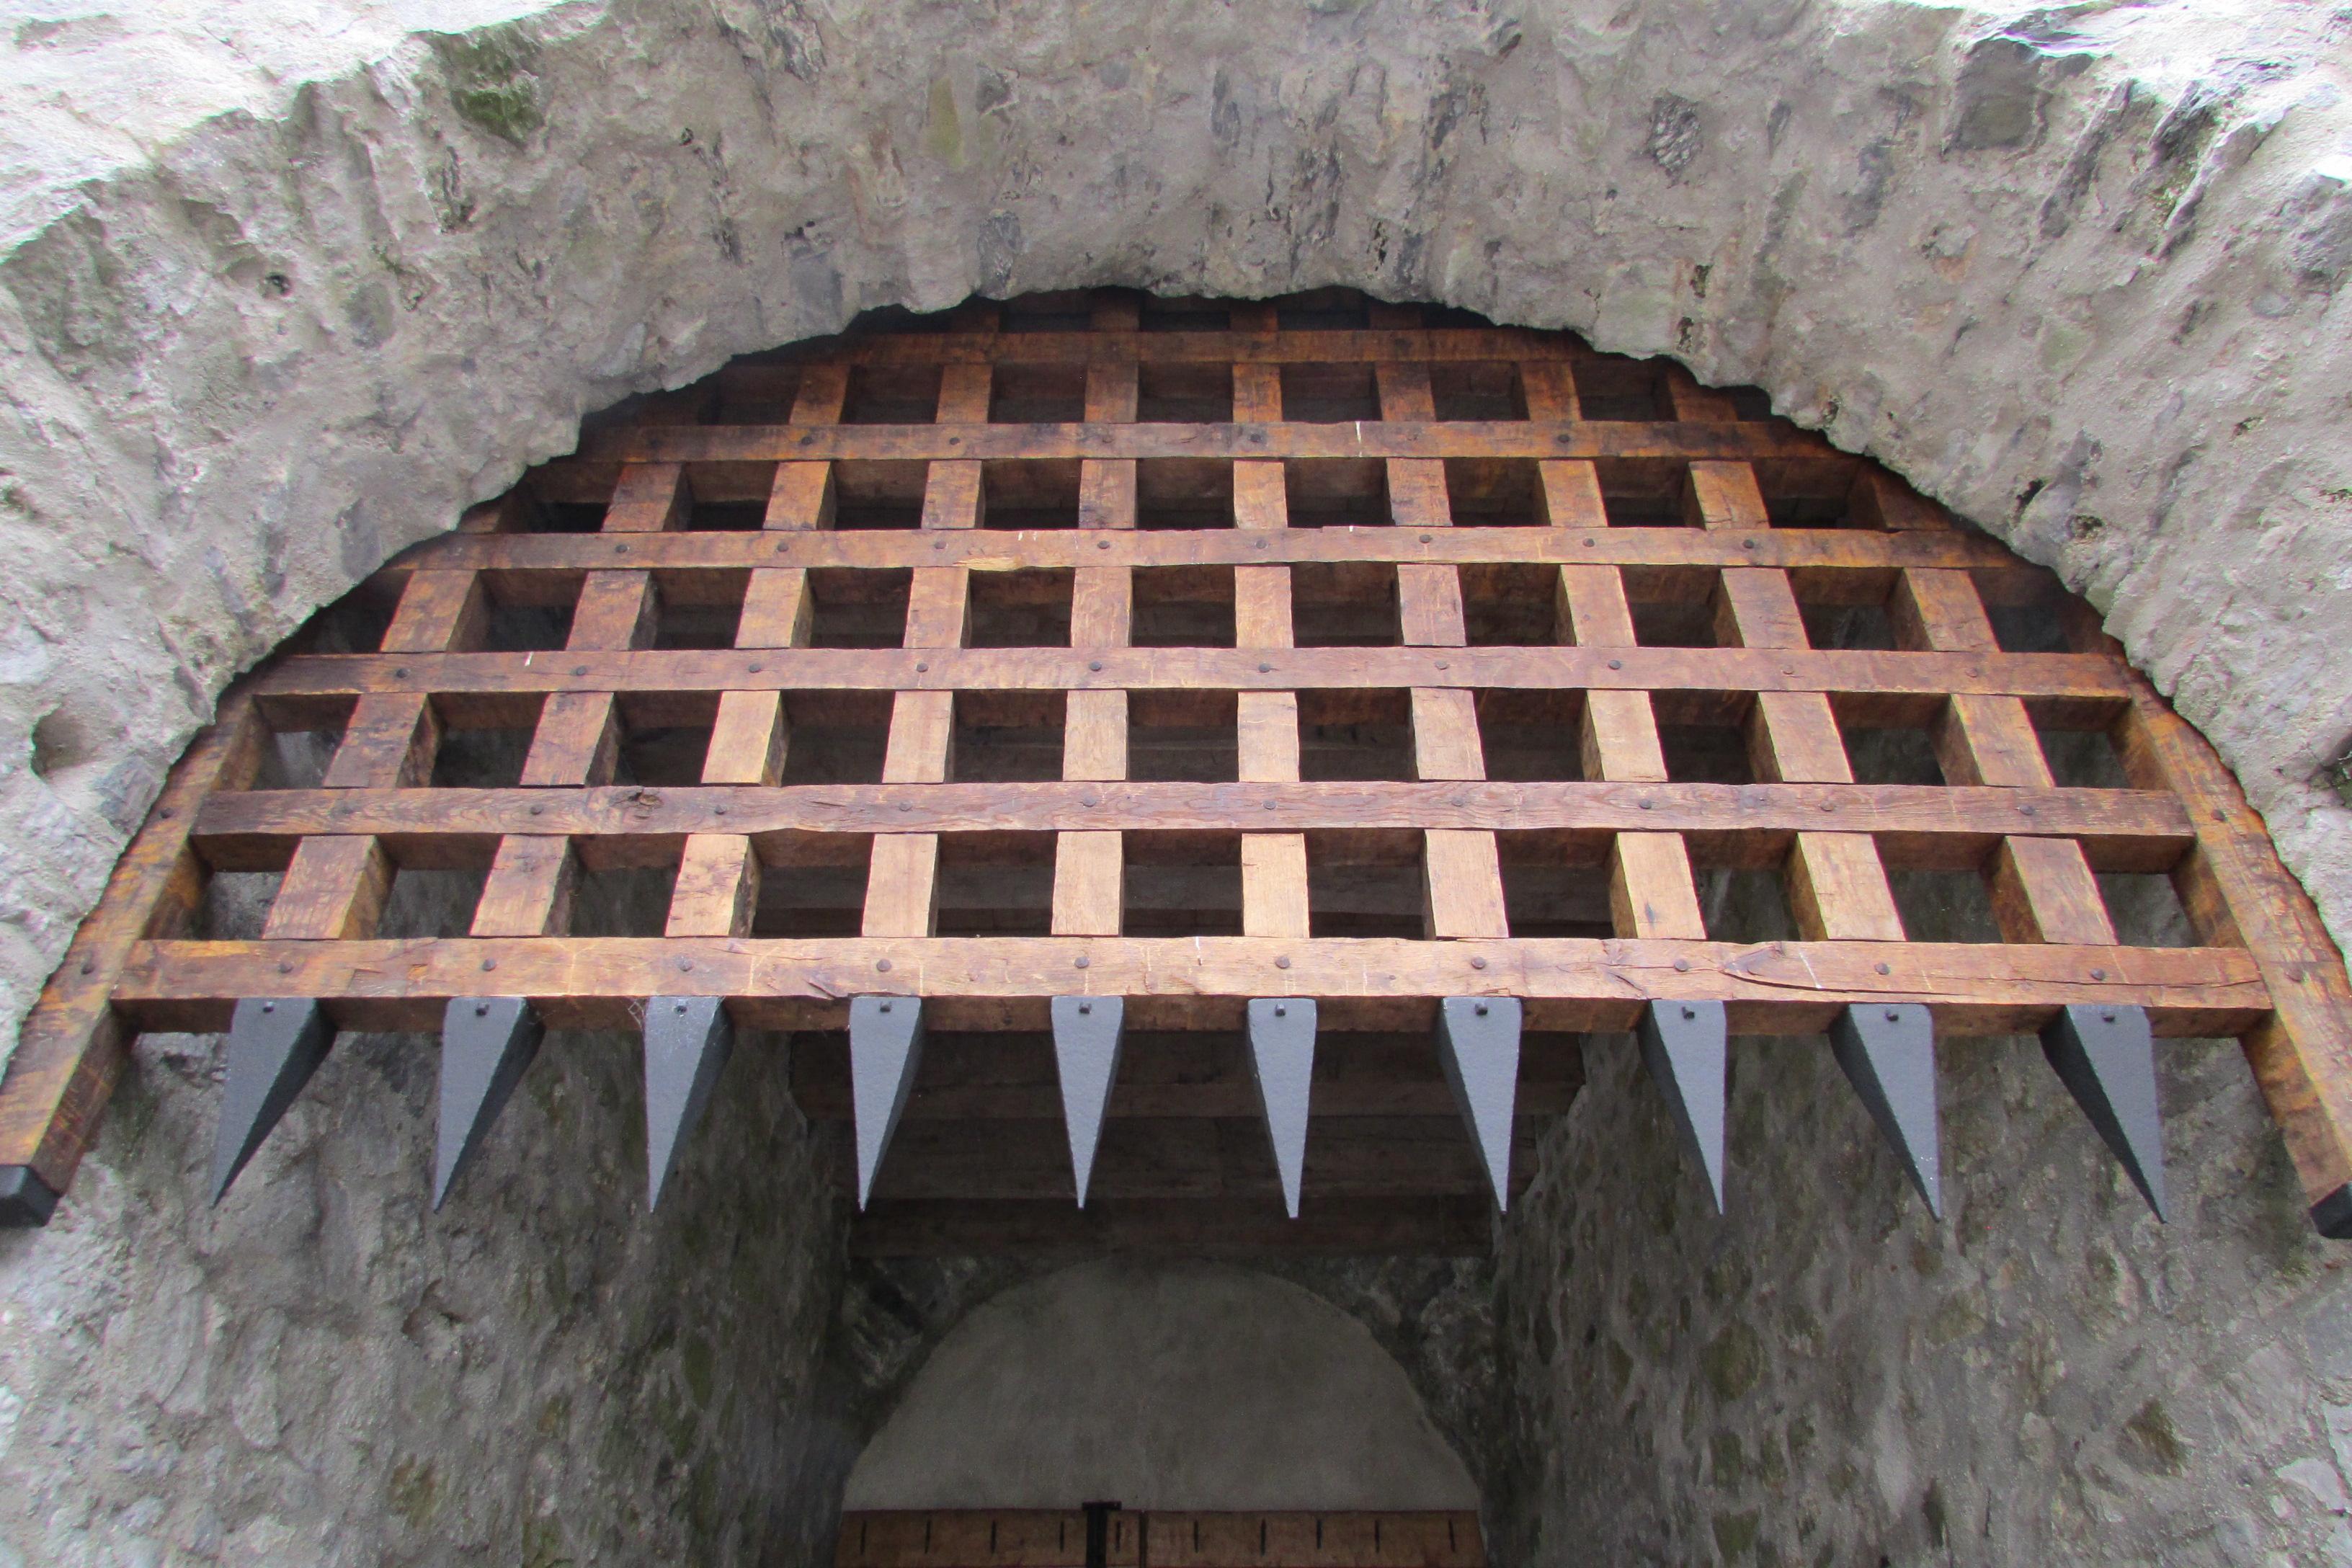 File:Main Gate -Portcullis 2016-09-03 08 519.jpg - Wikimedia Commons